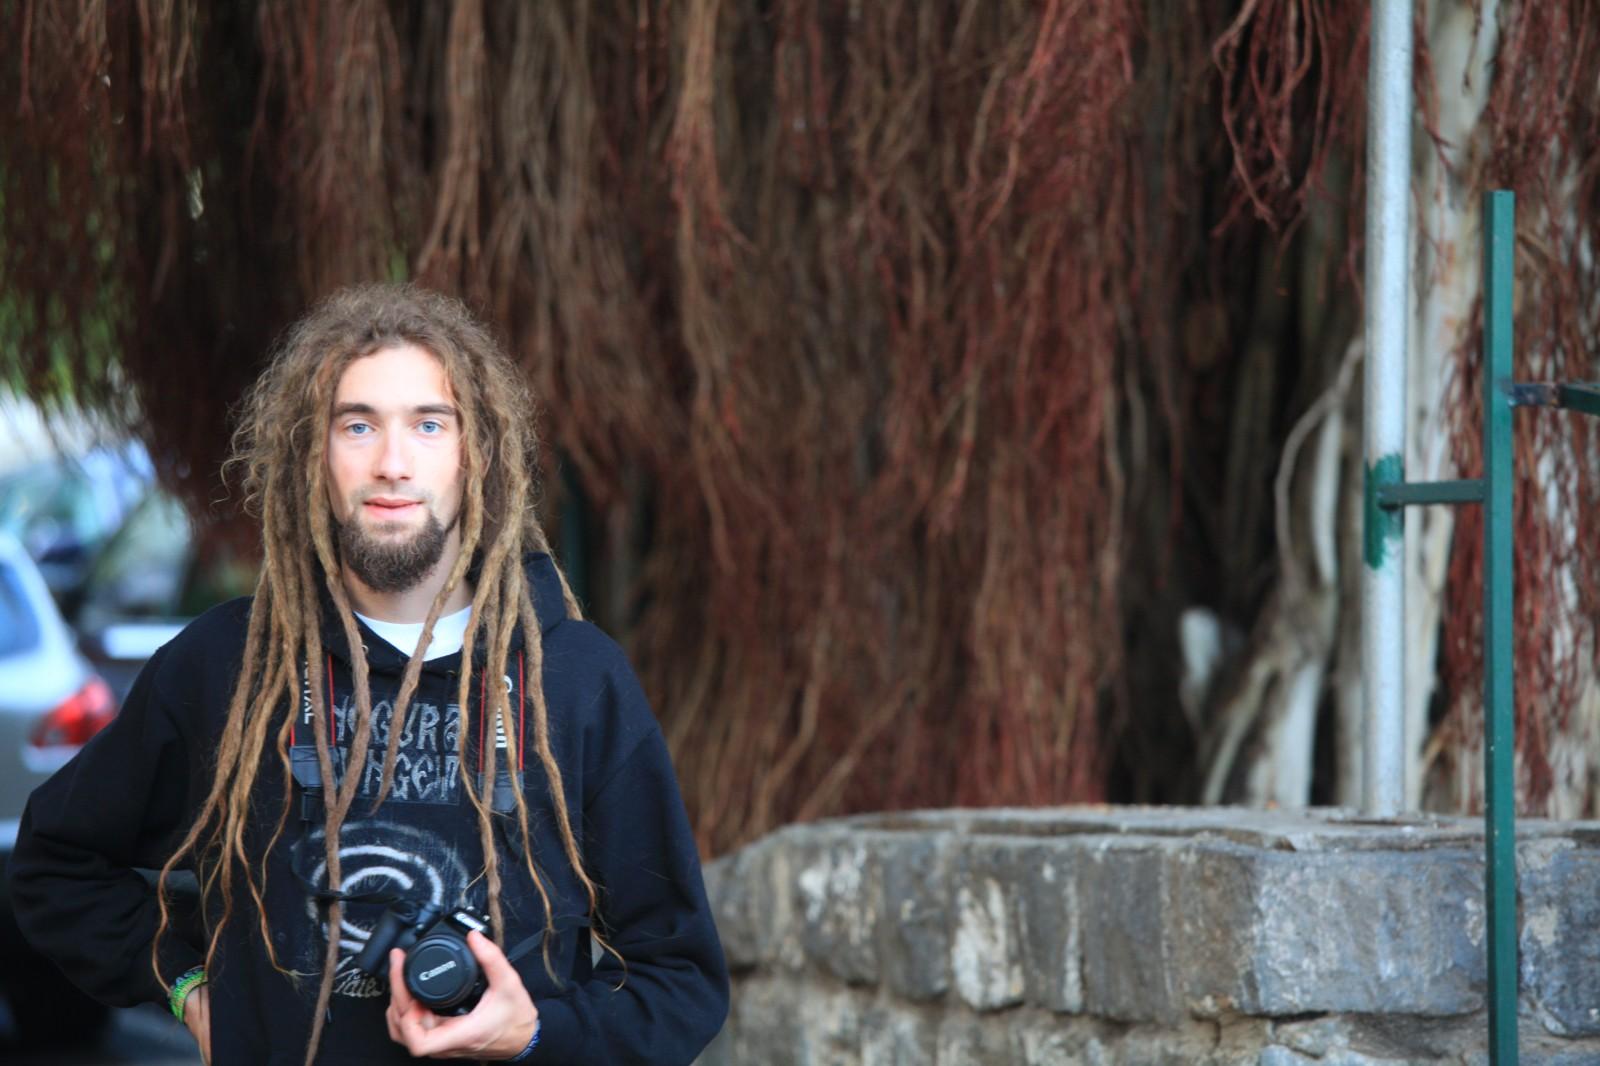 Human hair vs Tree roots :-)